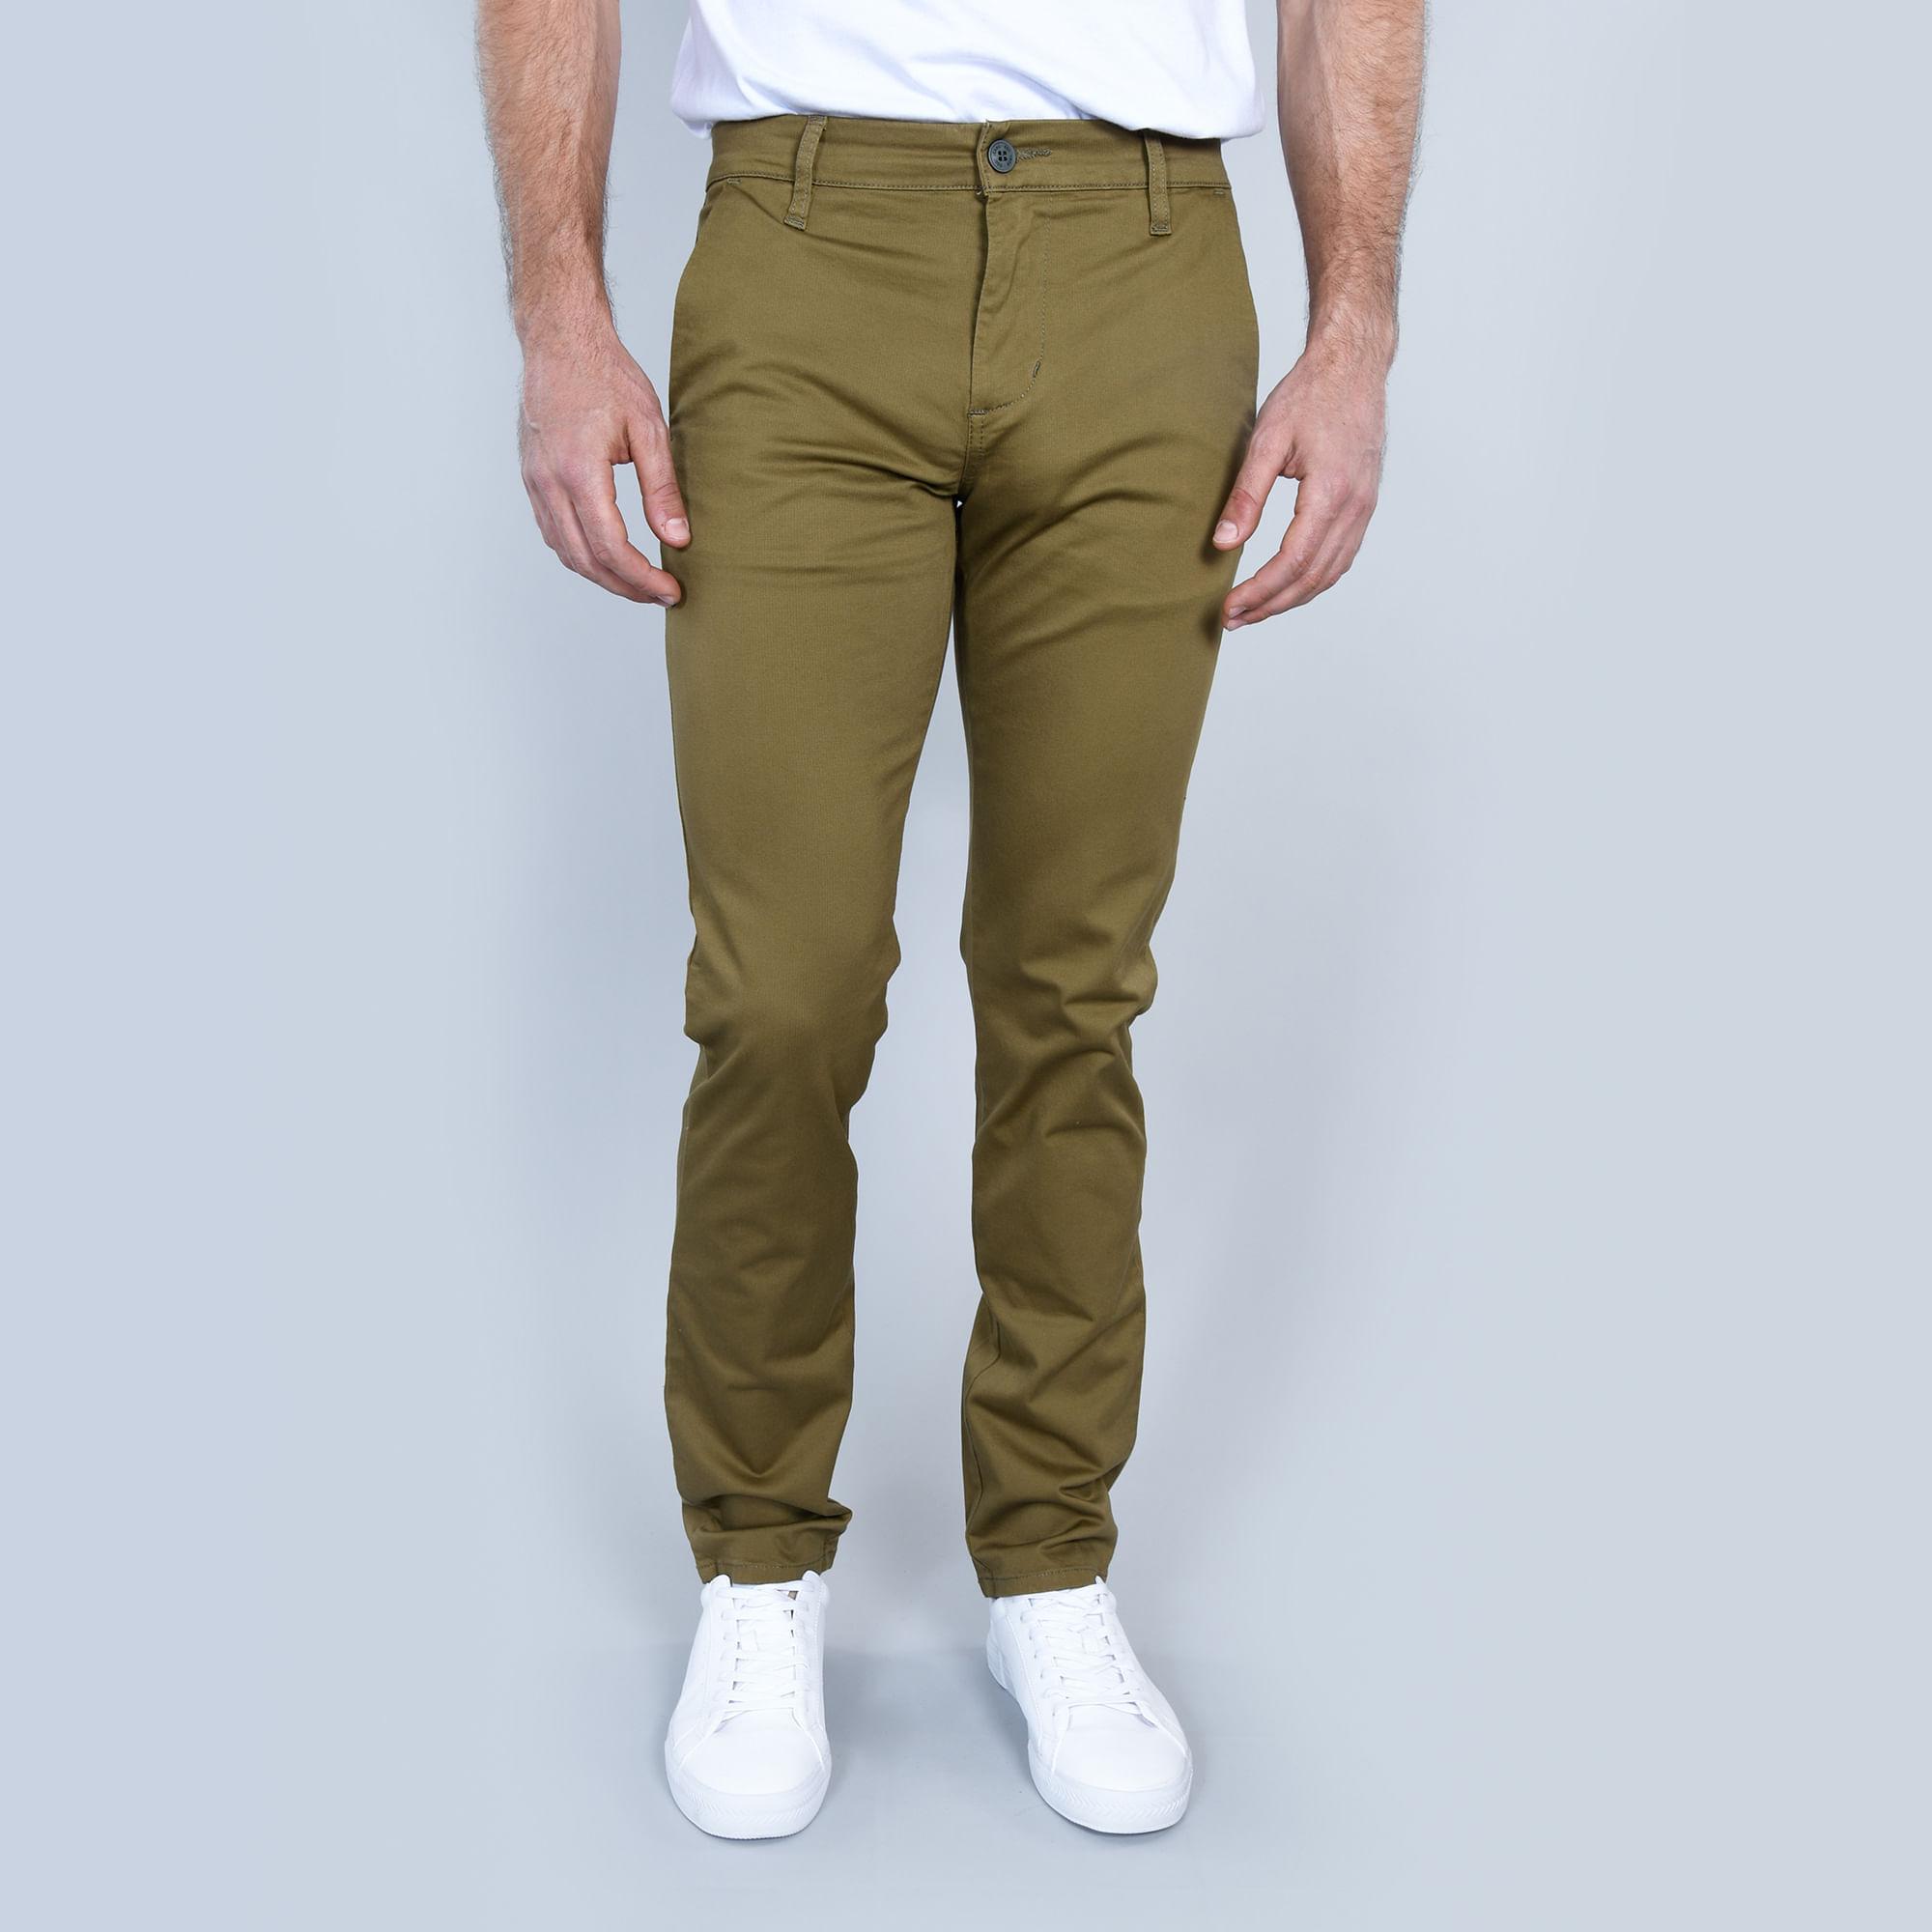 Compra Pantalon Chinos Slim New Frost Olive I Hombre ...